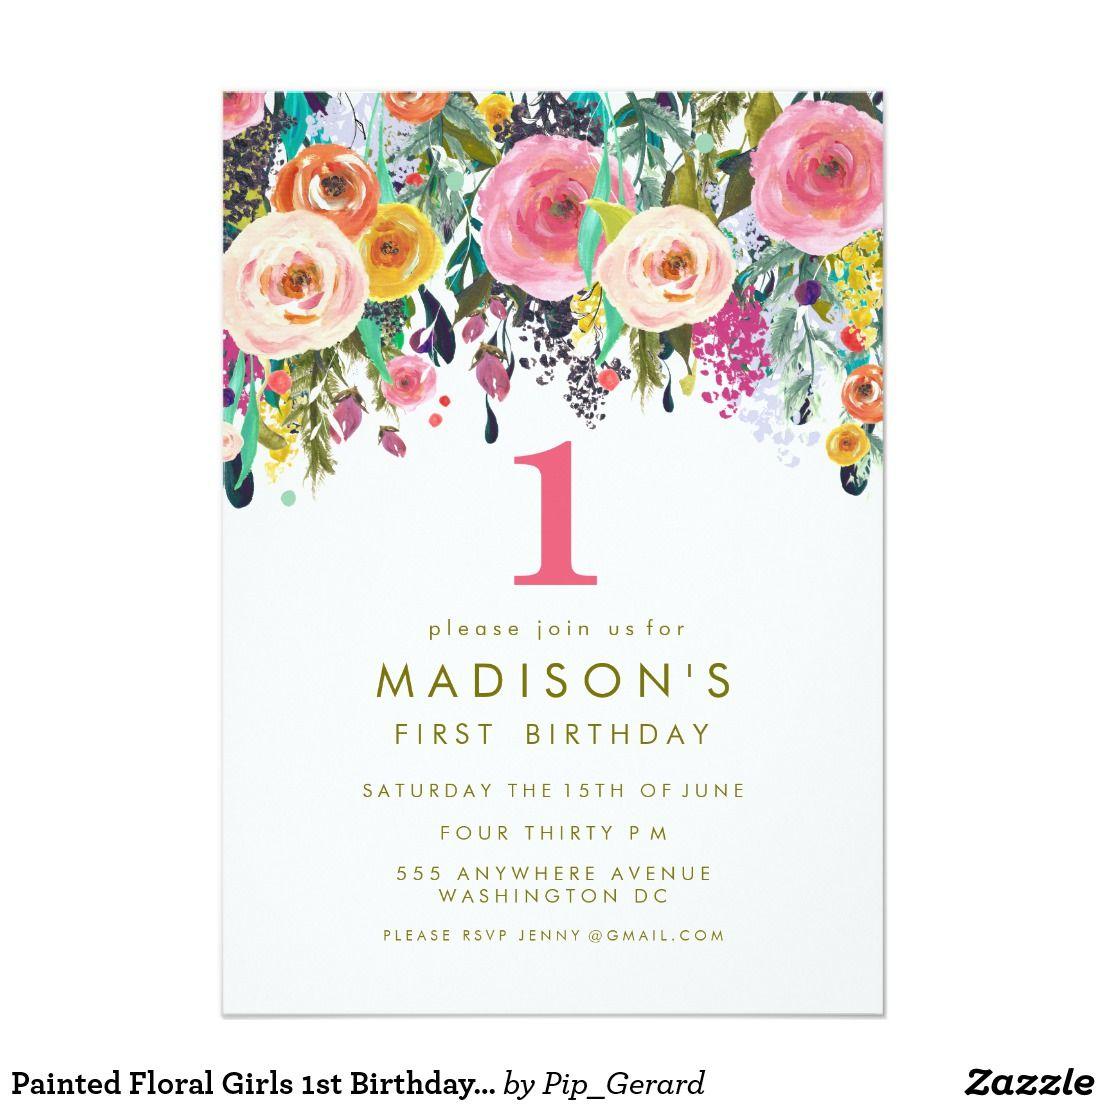 Painted Floral Girls 1st Birthday Invite | Pinterest | Birthdays and ...